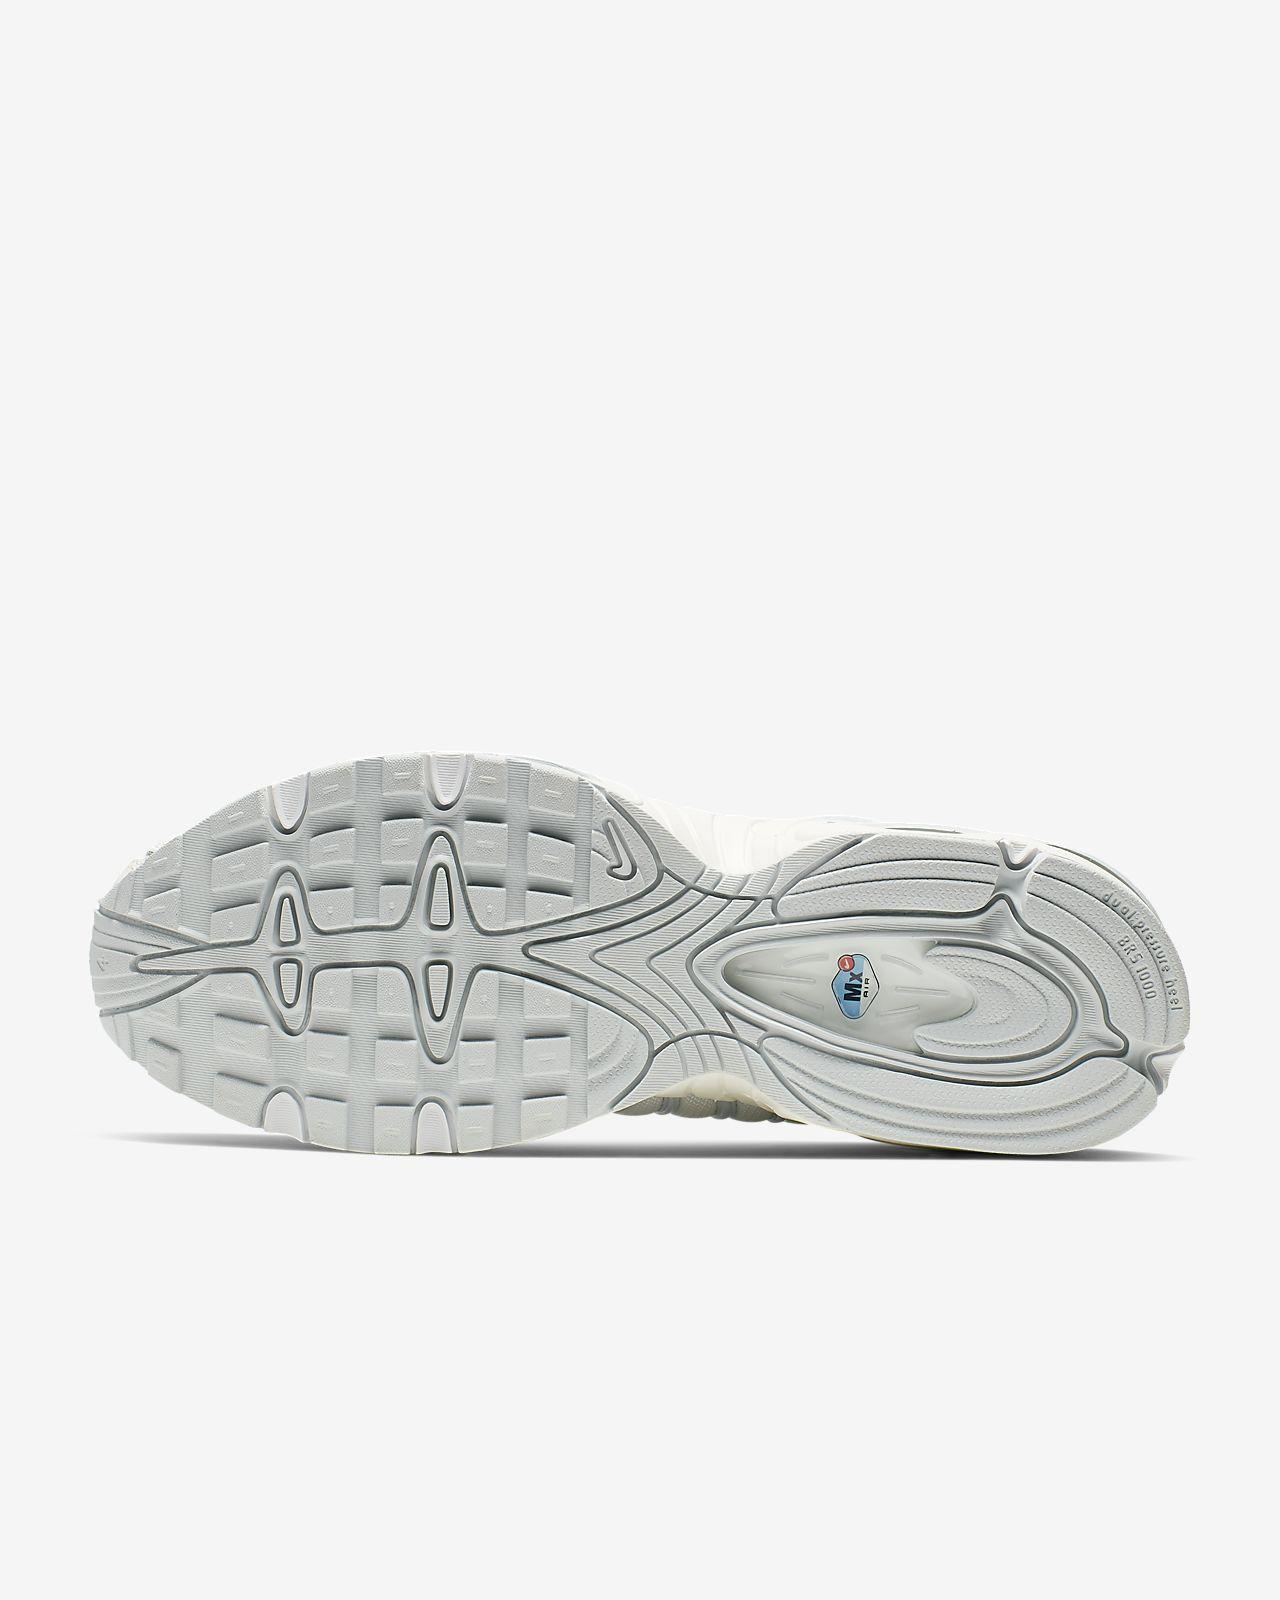 diccionario Bombero césped  Pánská bota Nike Air Max Tailwind IV. Nike CZ